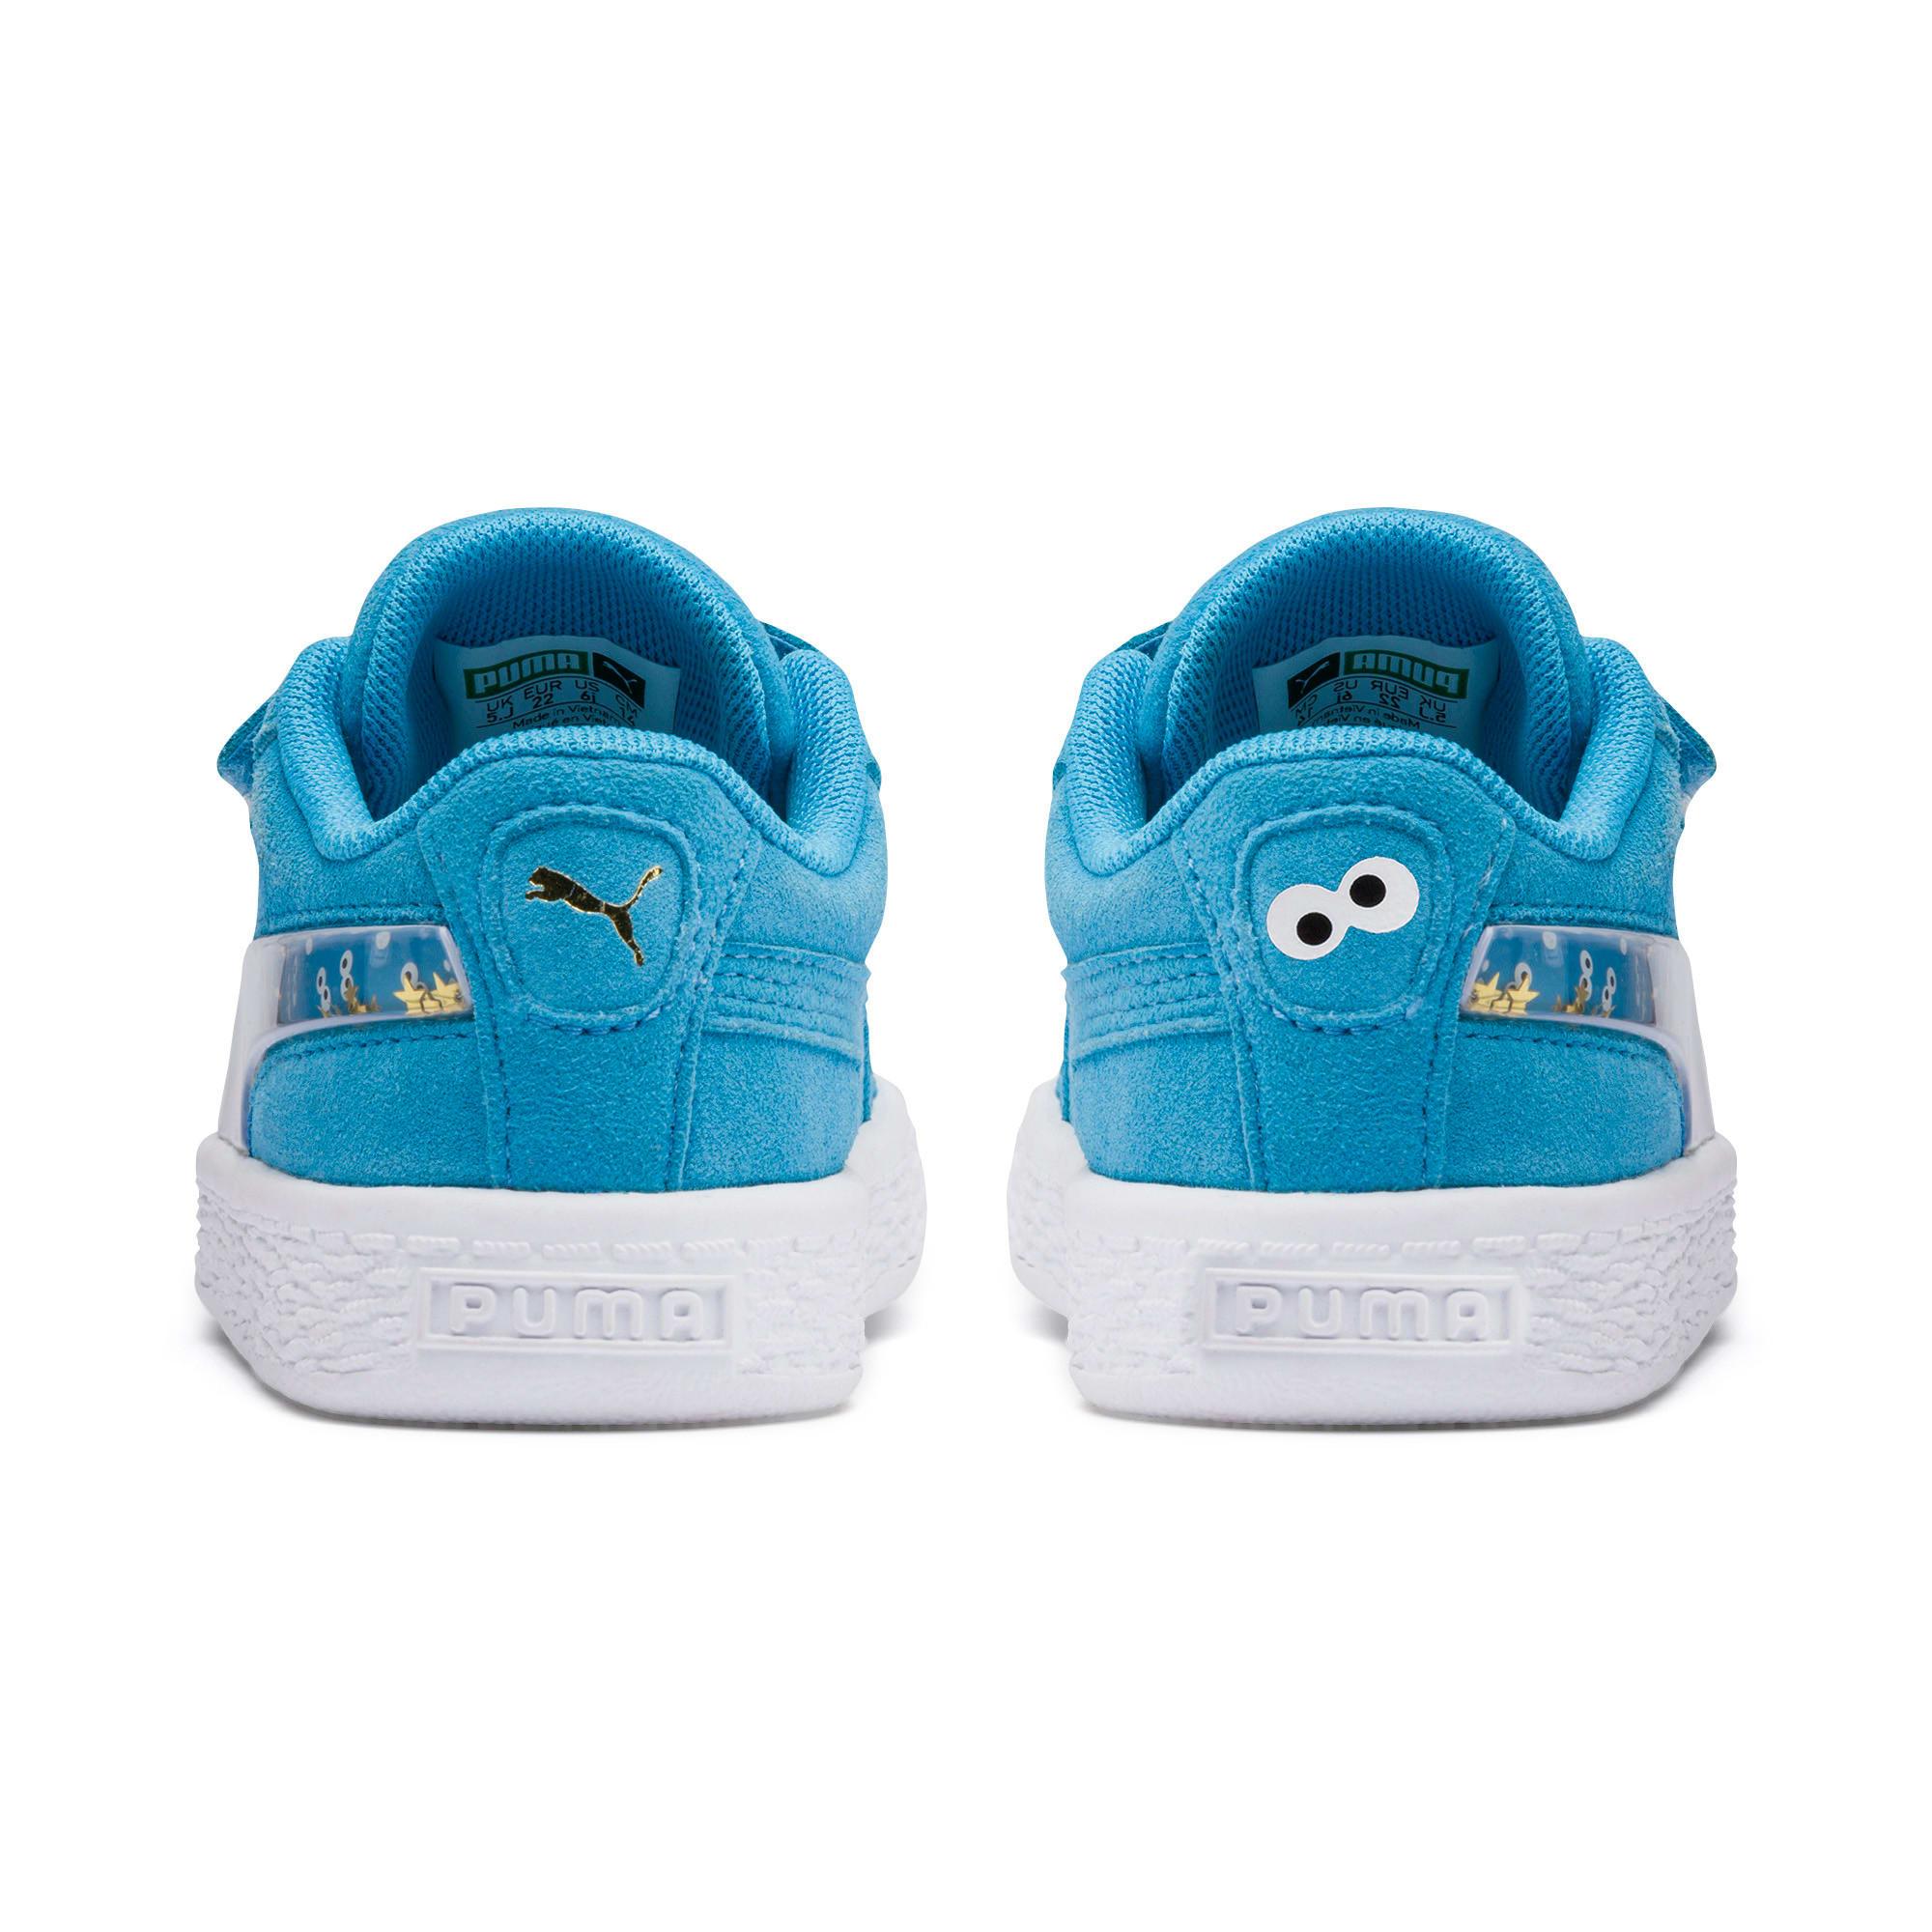 Thumbnail 3 of PUMA x SESAME STREET 50 Suede Statement Toddler Shoes, Bleu Azur-Puma White, medium